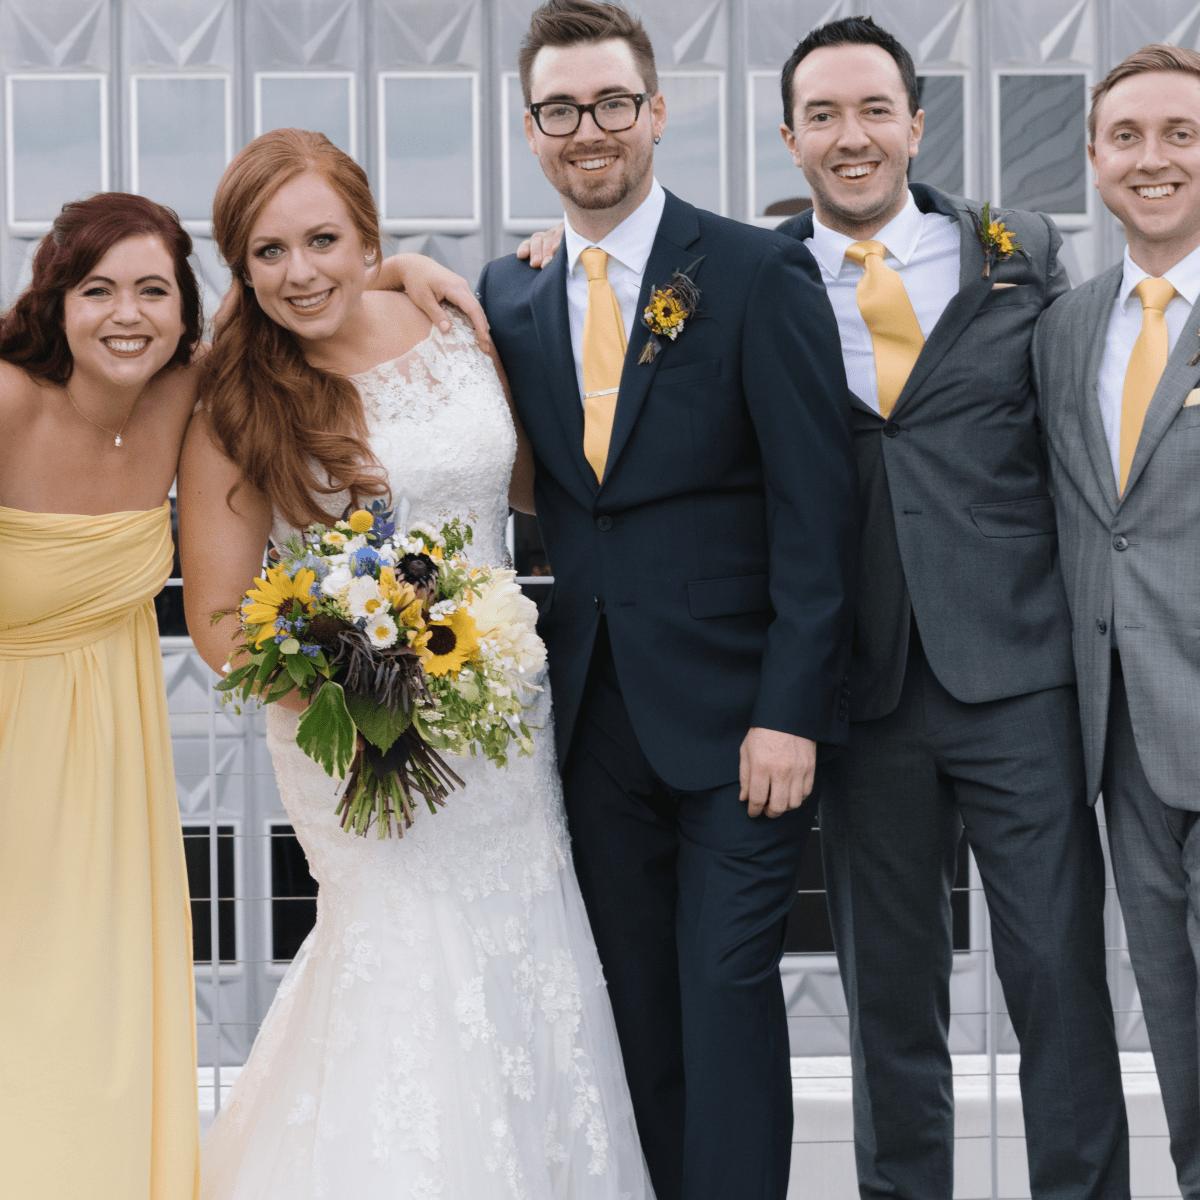 Collins Wedding, Wedding Party